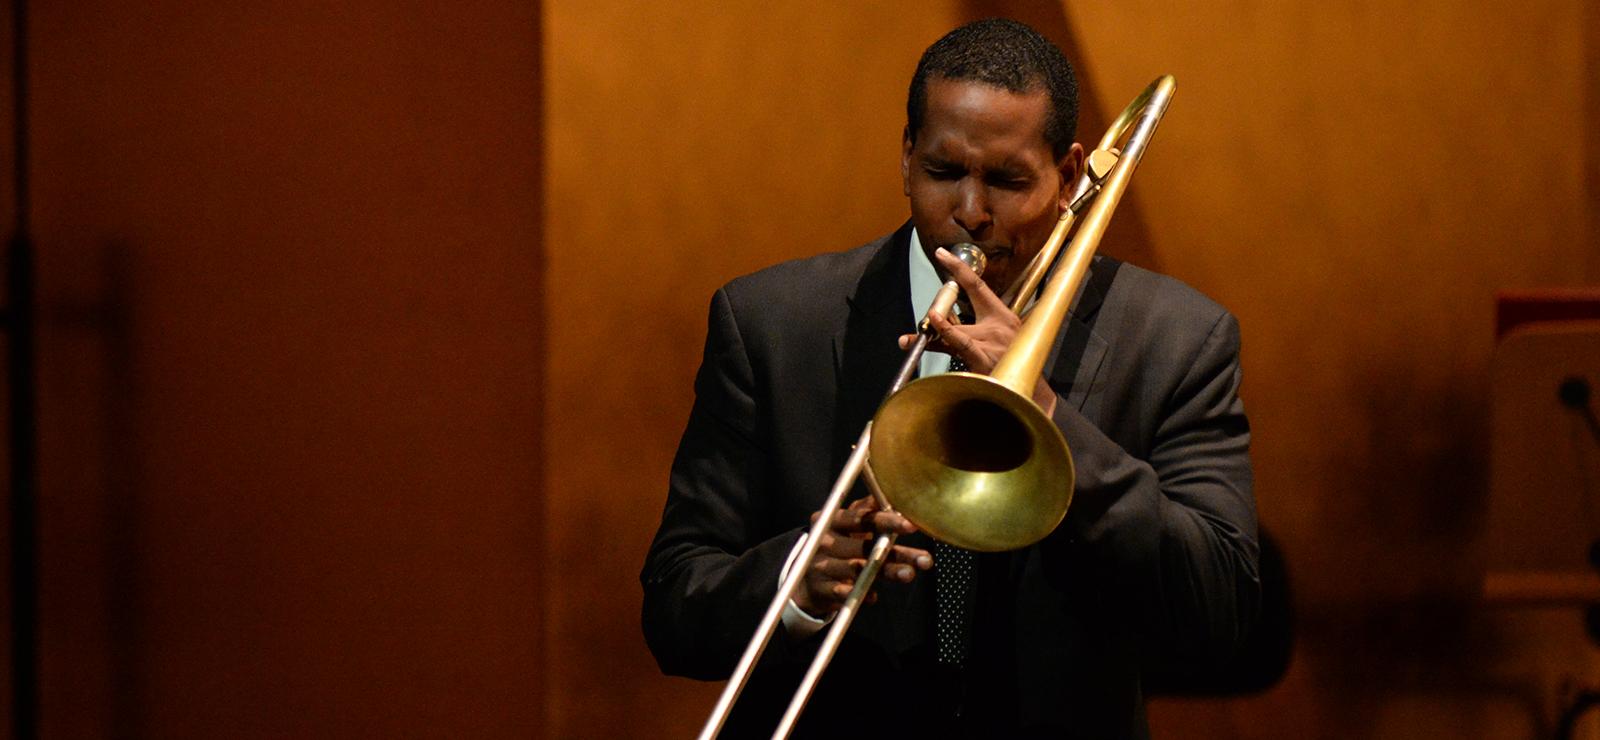 [Summer Jazz Academy Faculty] Photo: Frank Stewart